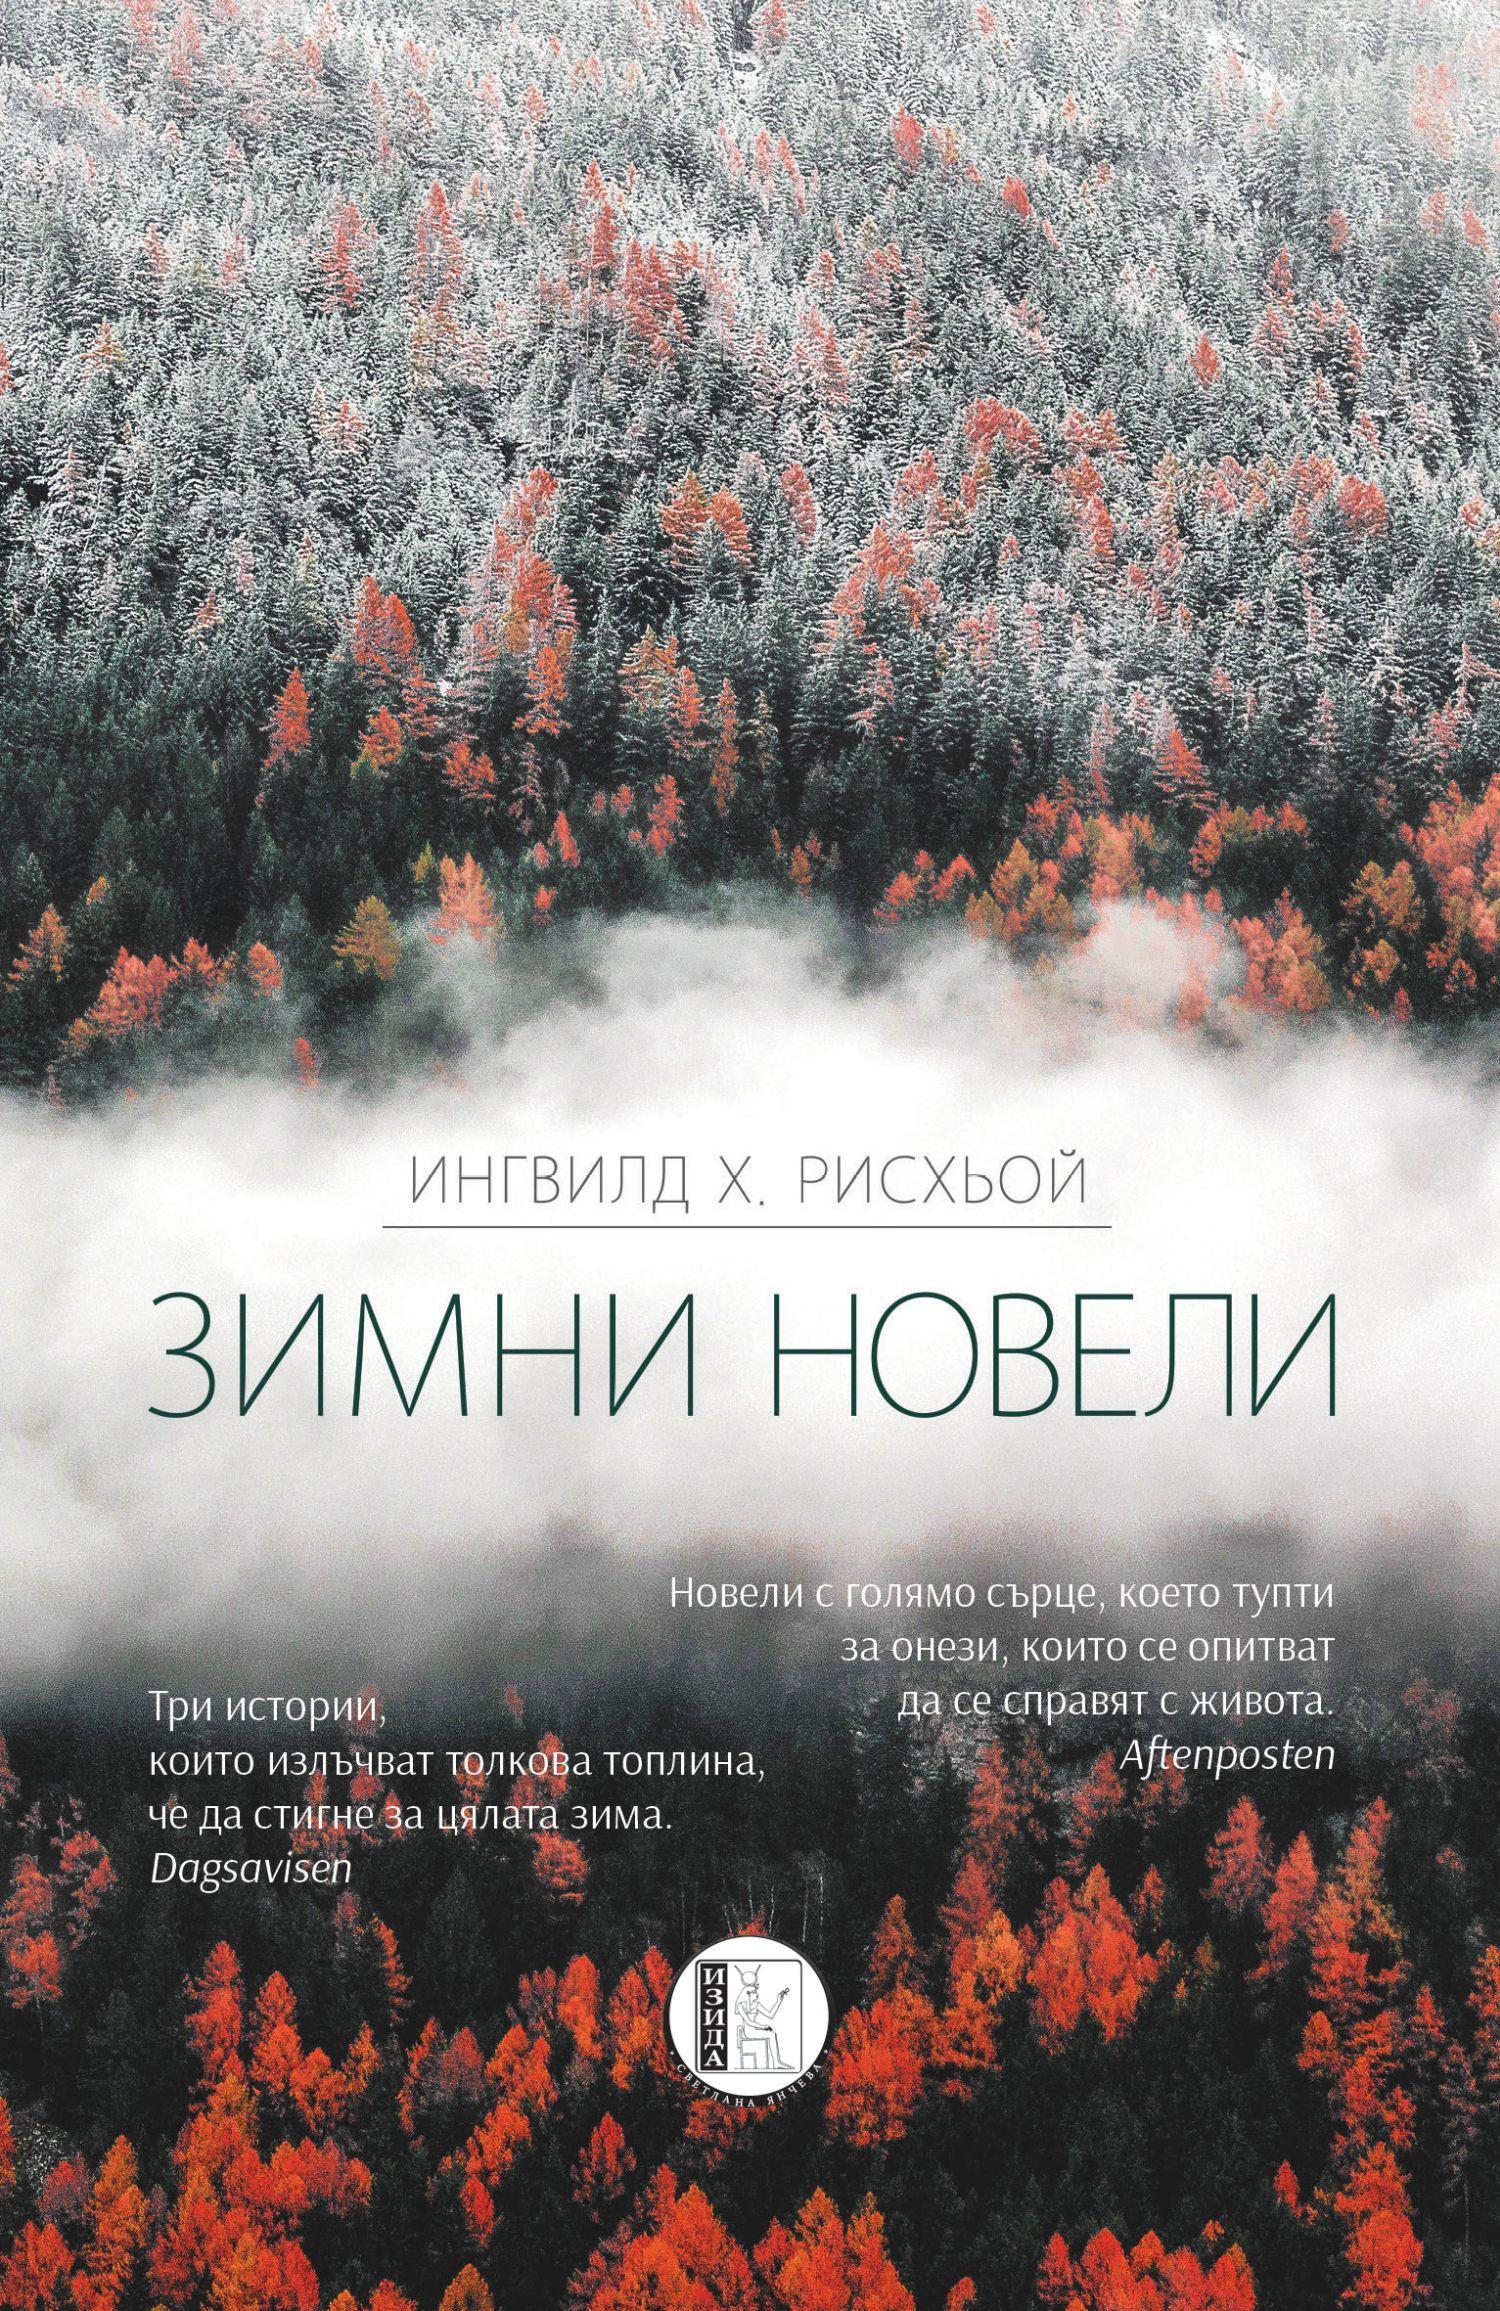 zimni-noveli - 1